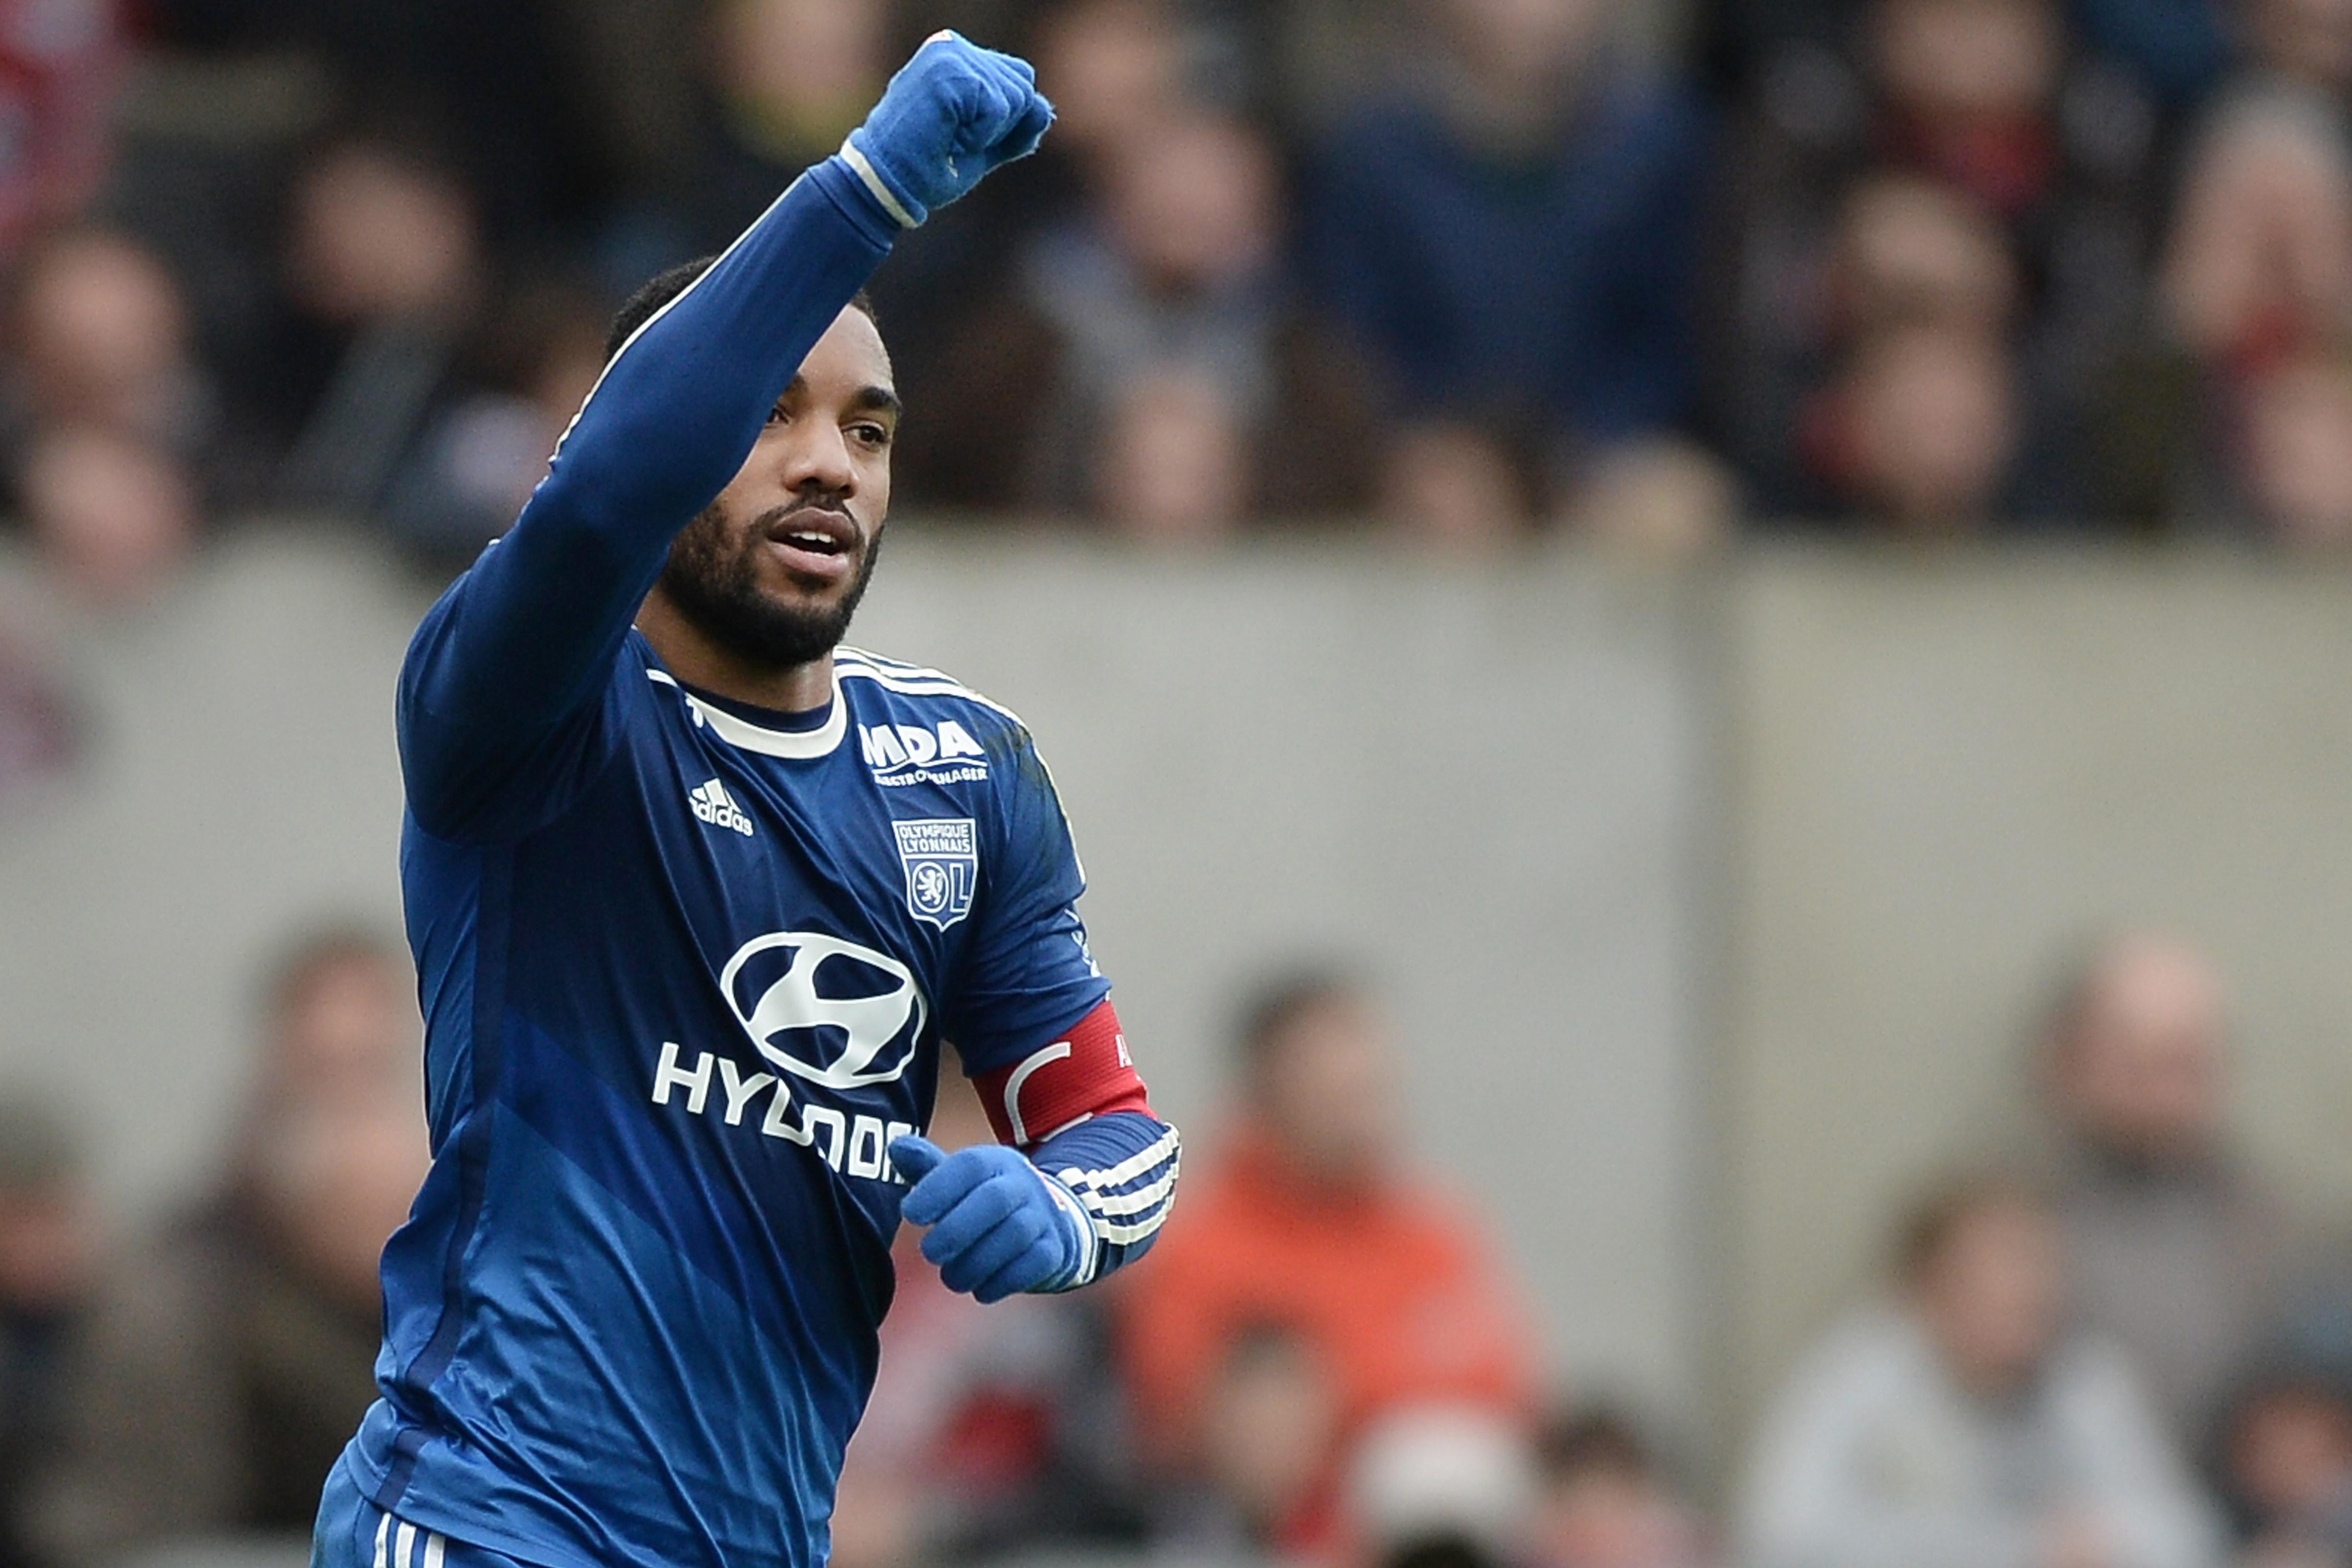 Https Www Tudn Com Futbol Ligue 1 Paris Saint Germain Vs